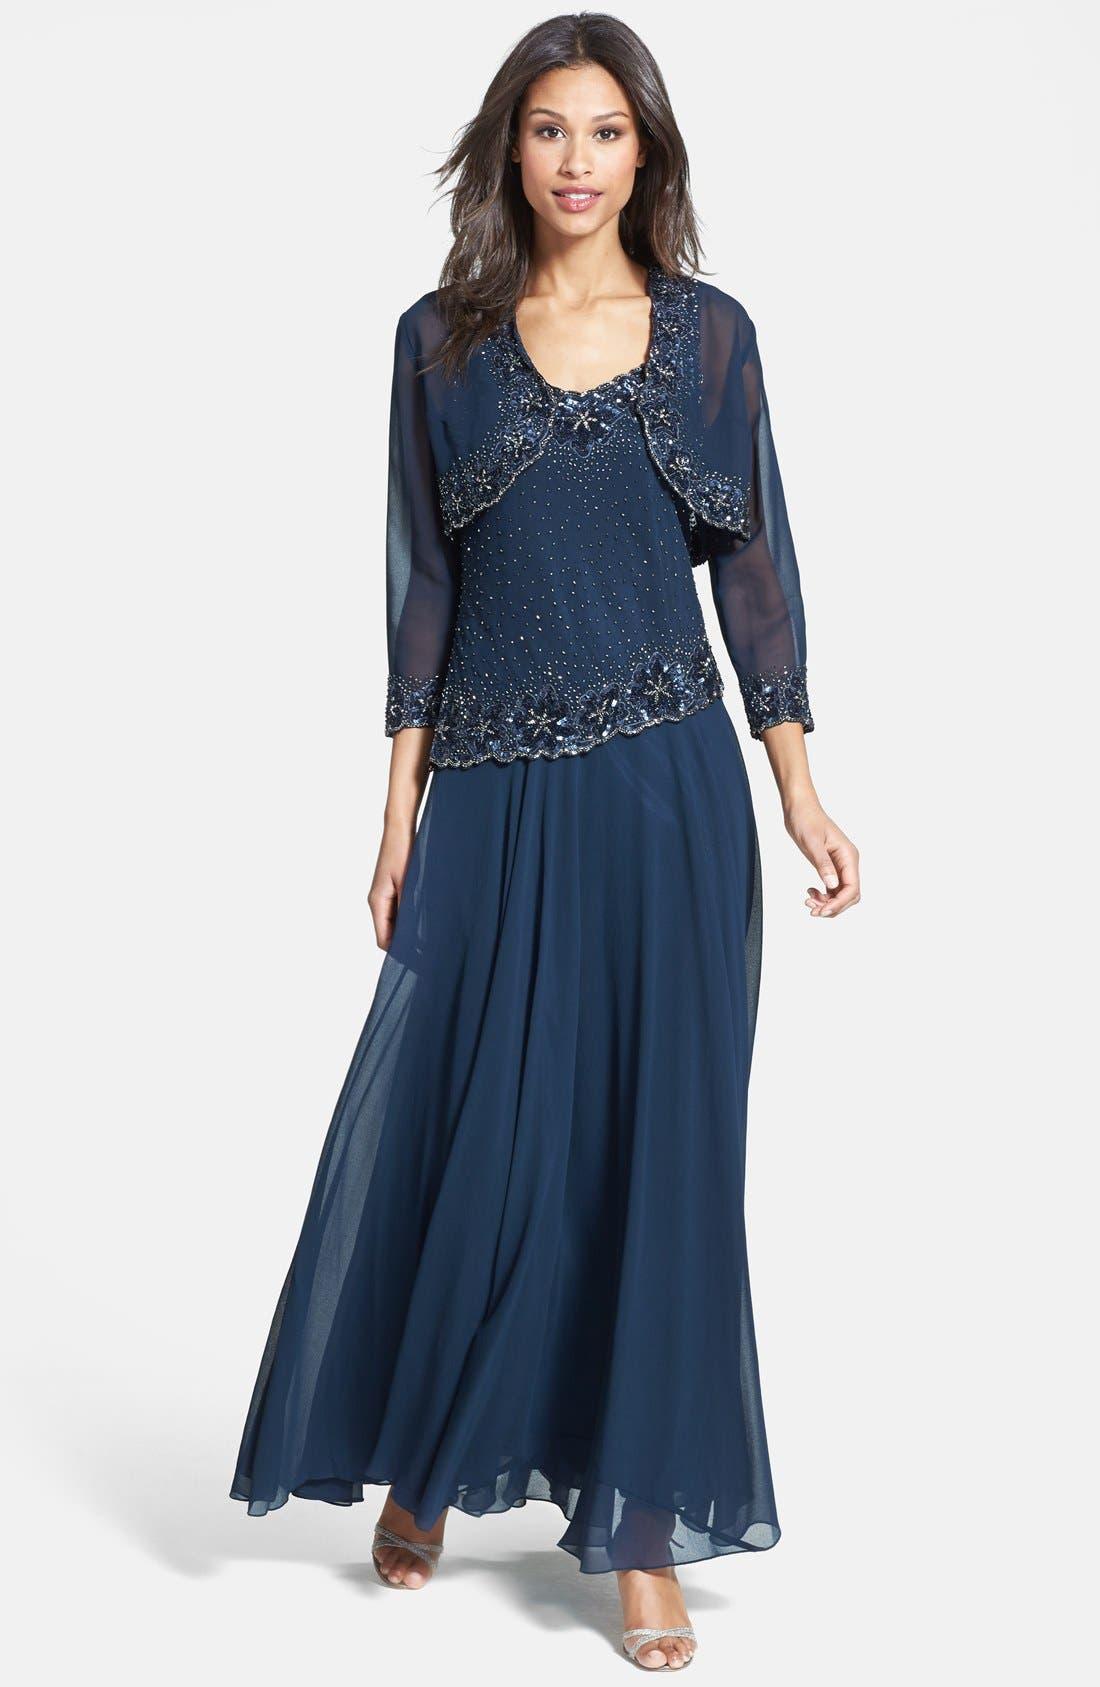 Main Image - J Kara Embellished Chiffon Dress & Bolero